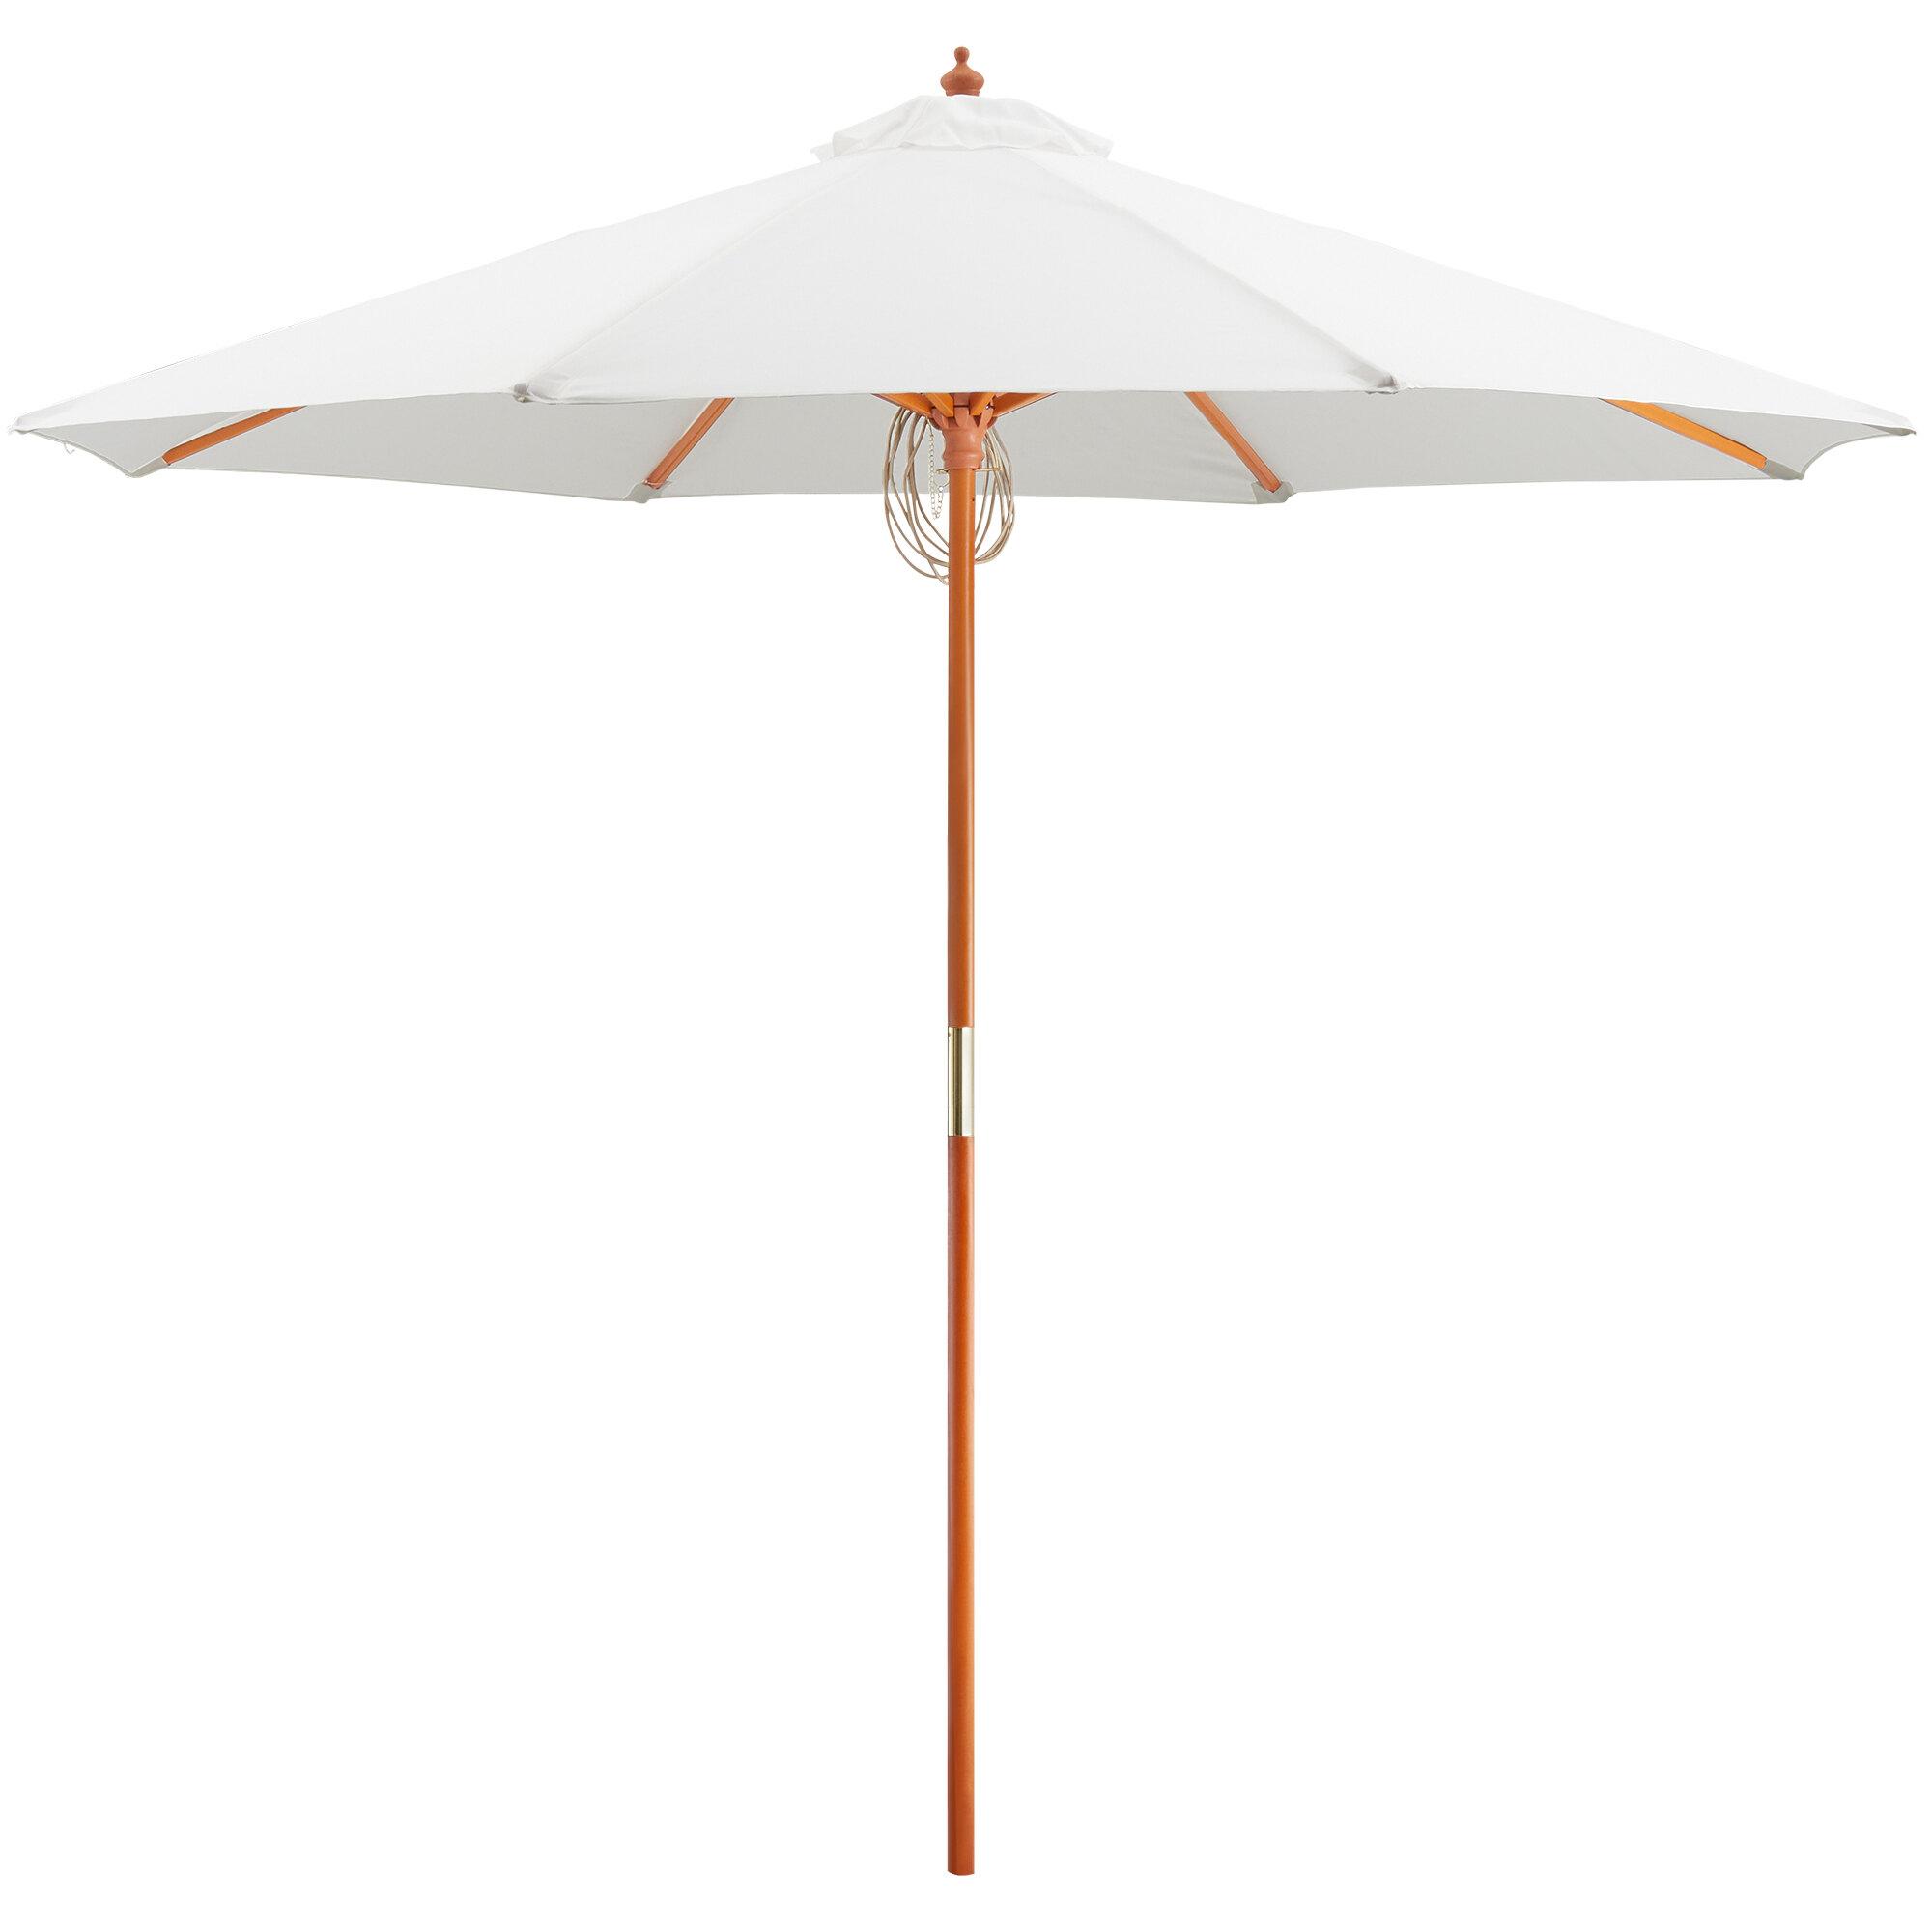 "#17 - 9 FT Round White Pulley Lift Umbrella with 1 1/2"" Hardwood Pole"